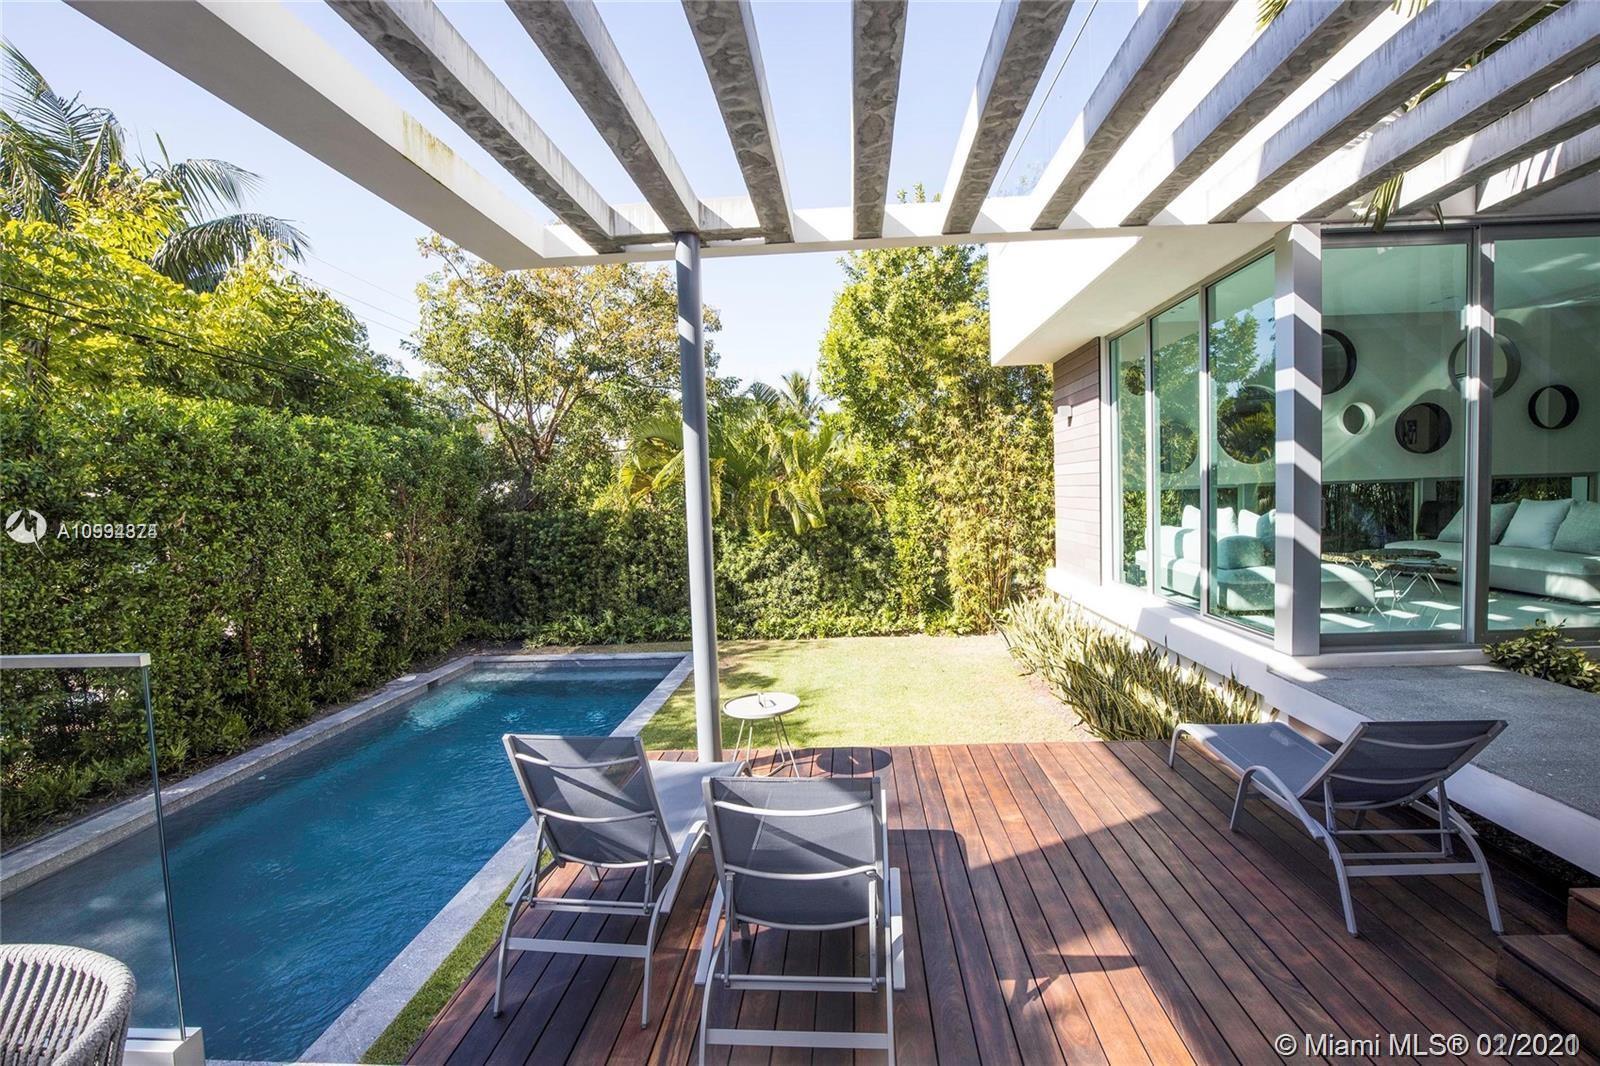 Tropical Isle Homes #320 - 320 W Heather Dr #320, Key Biscayne, FL 33149